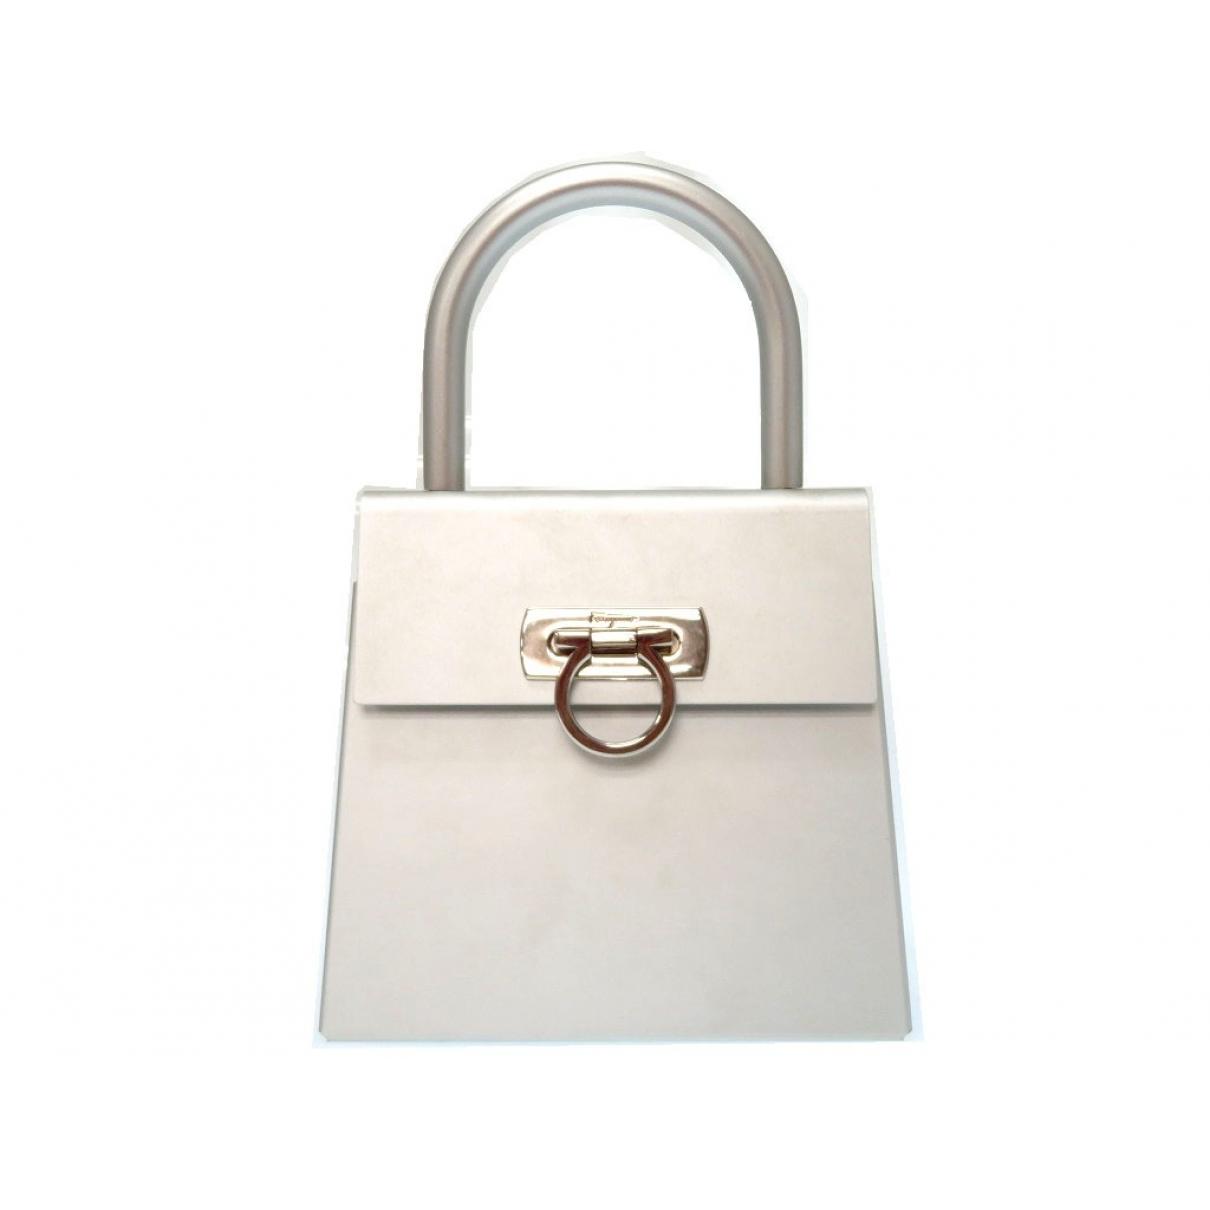 Salvatore Ferragamo \N Silver Metal handbag for Women \N